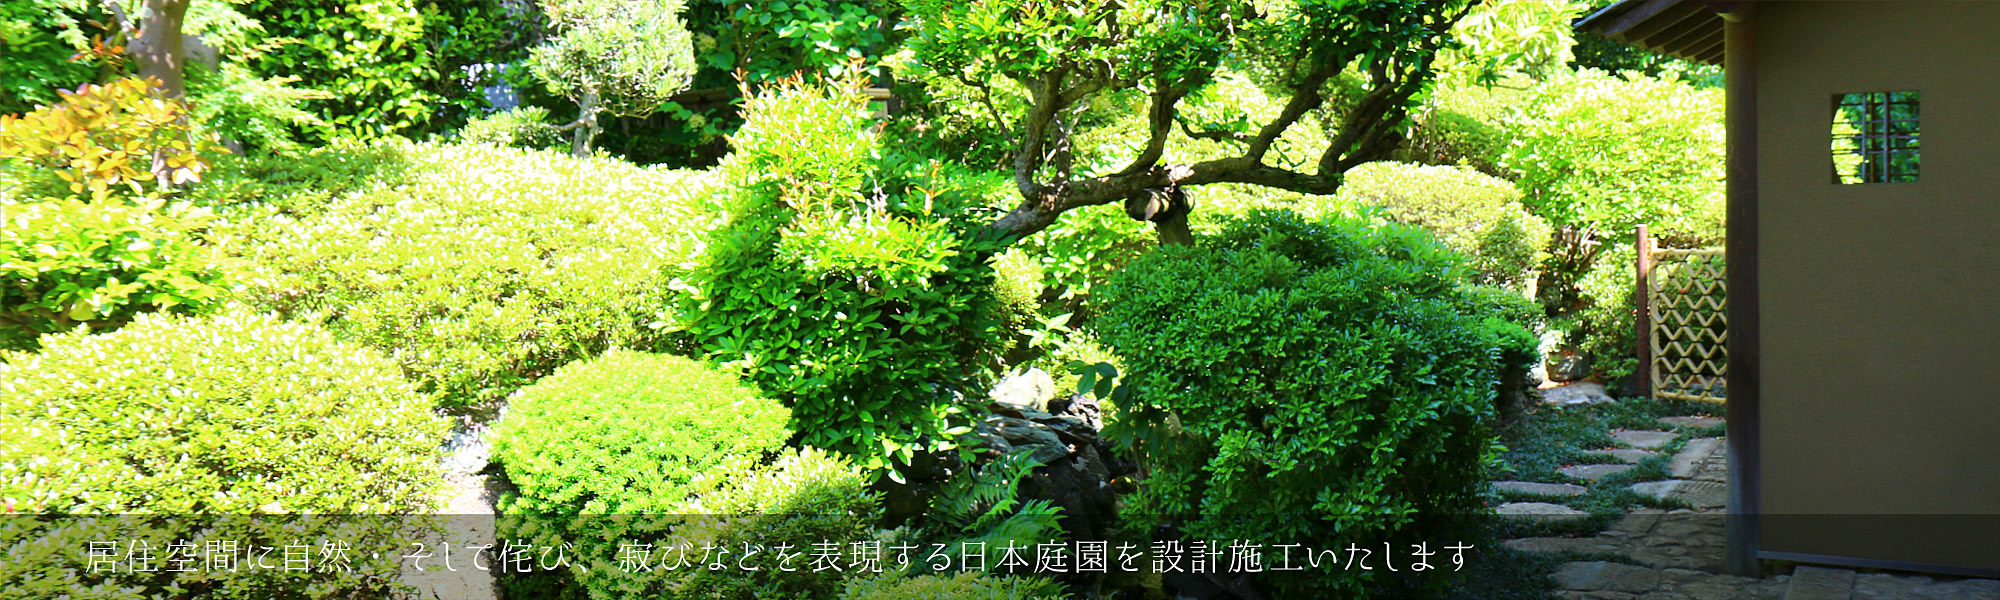 <a href='http://yakigaya-zouen.com/archives/672'></a>